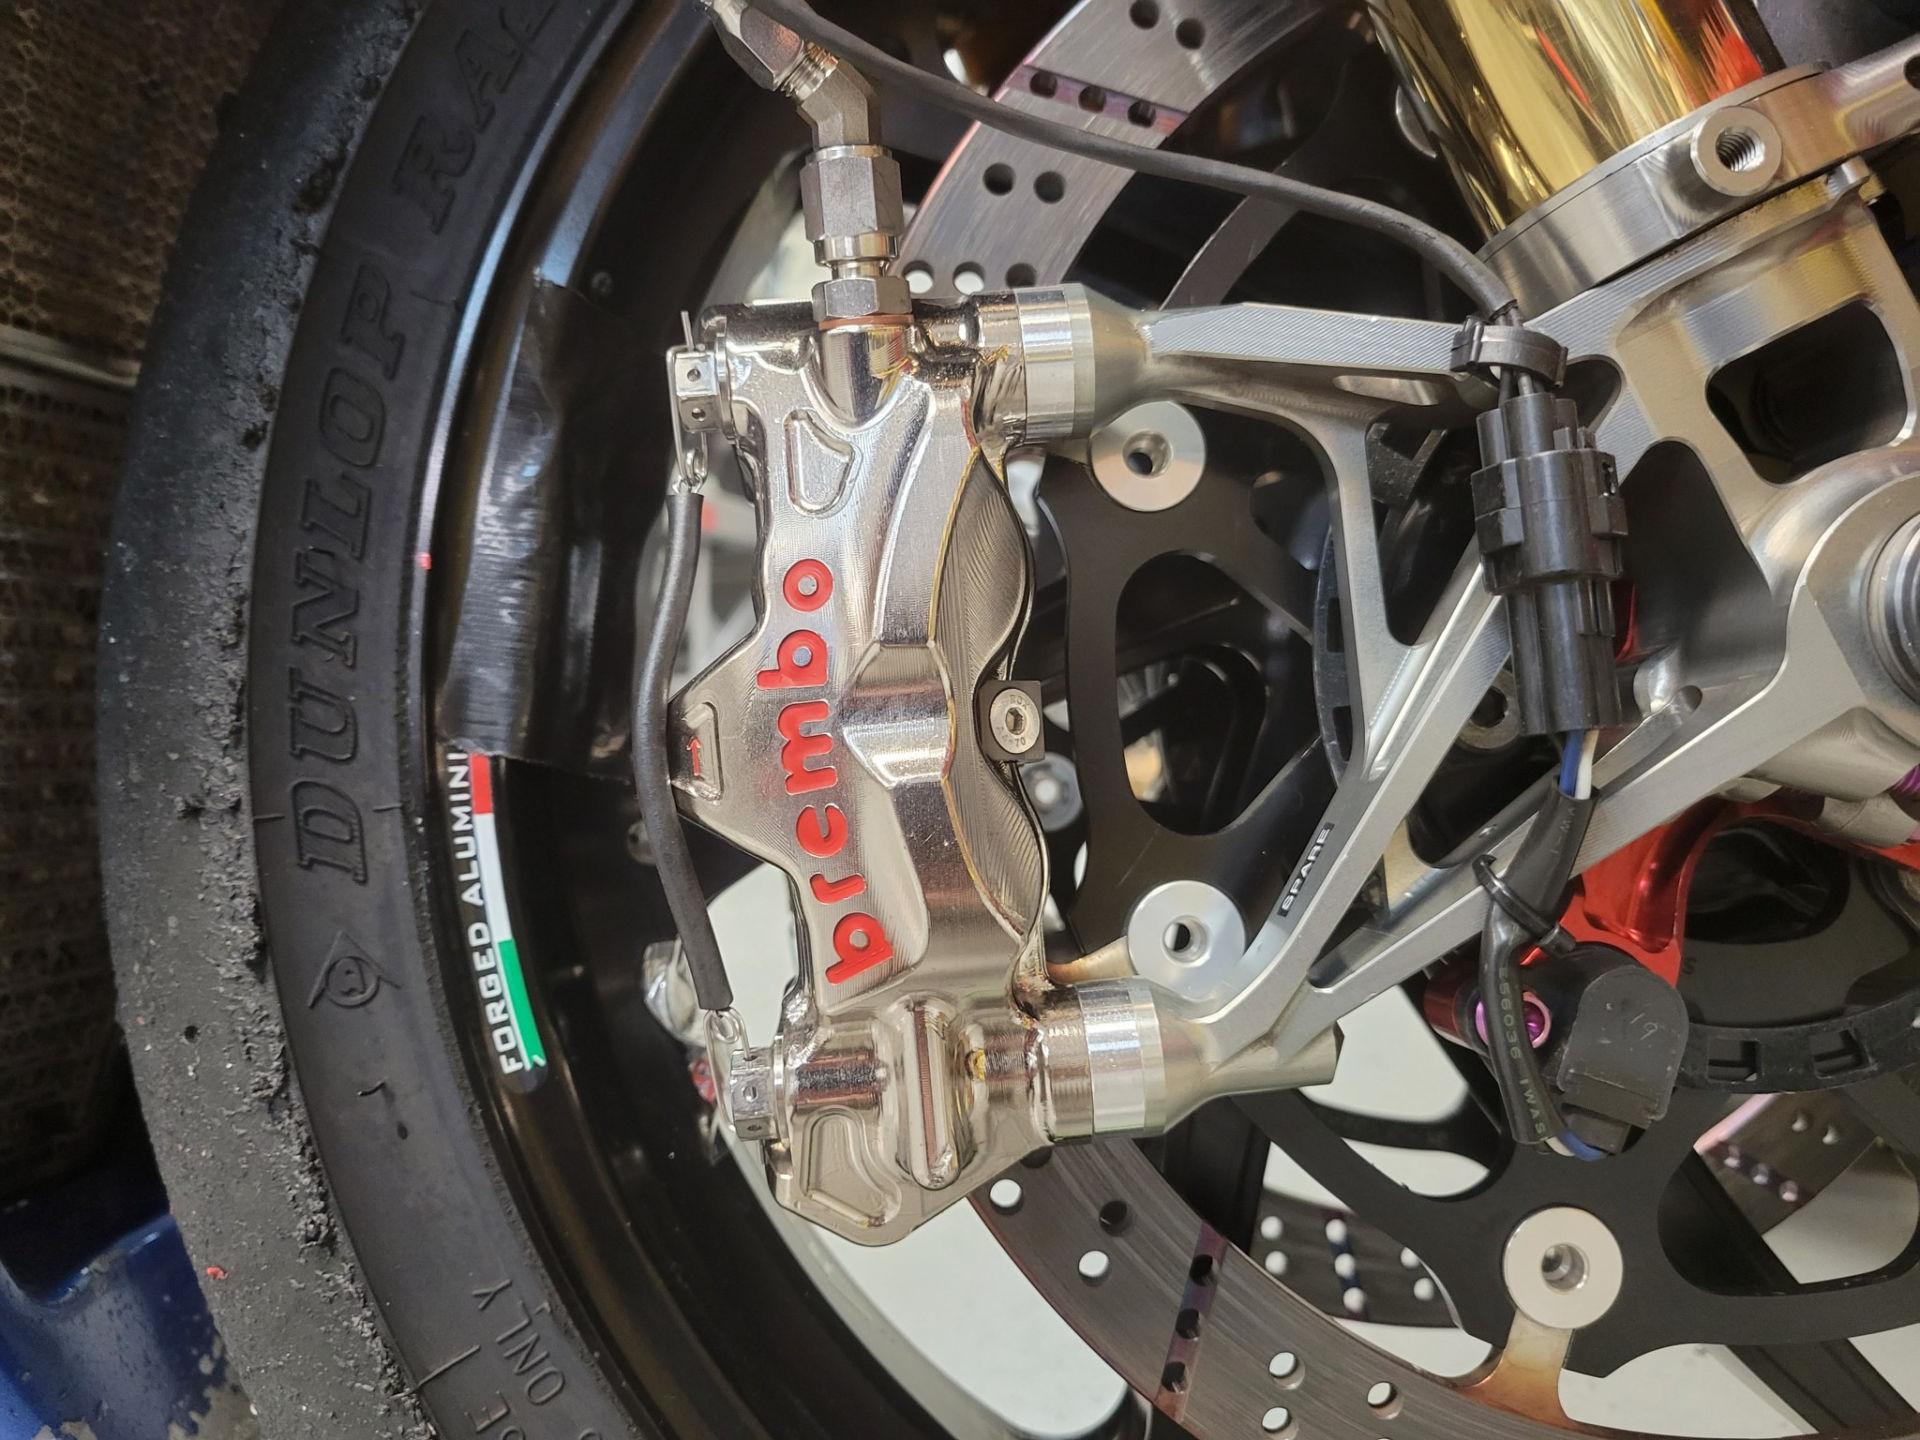 Brembo racing brake caliper on a MotoAmerica Superbike. Photo by Keith Perry.